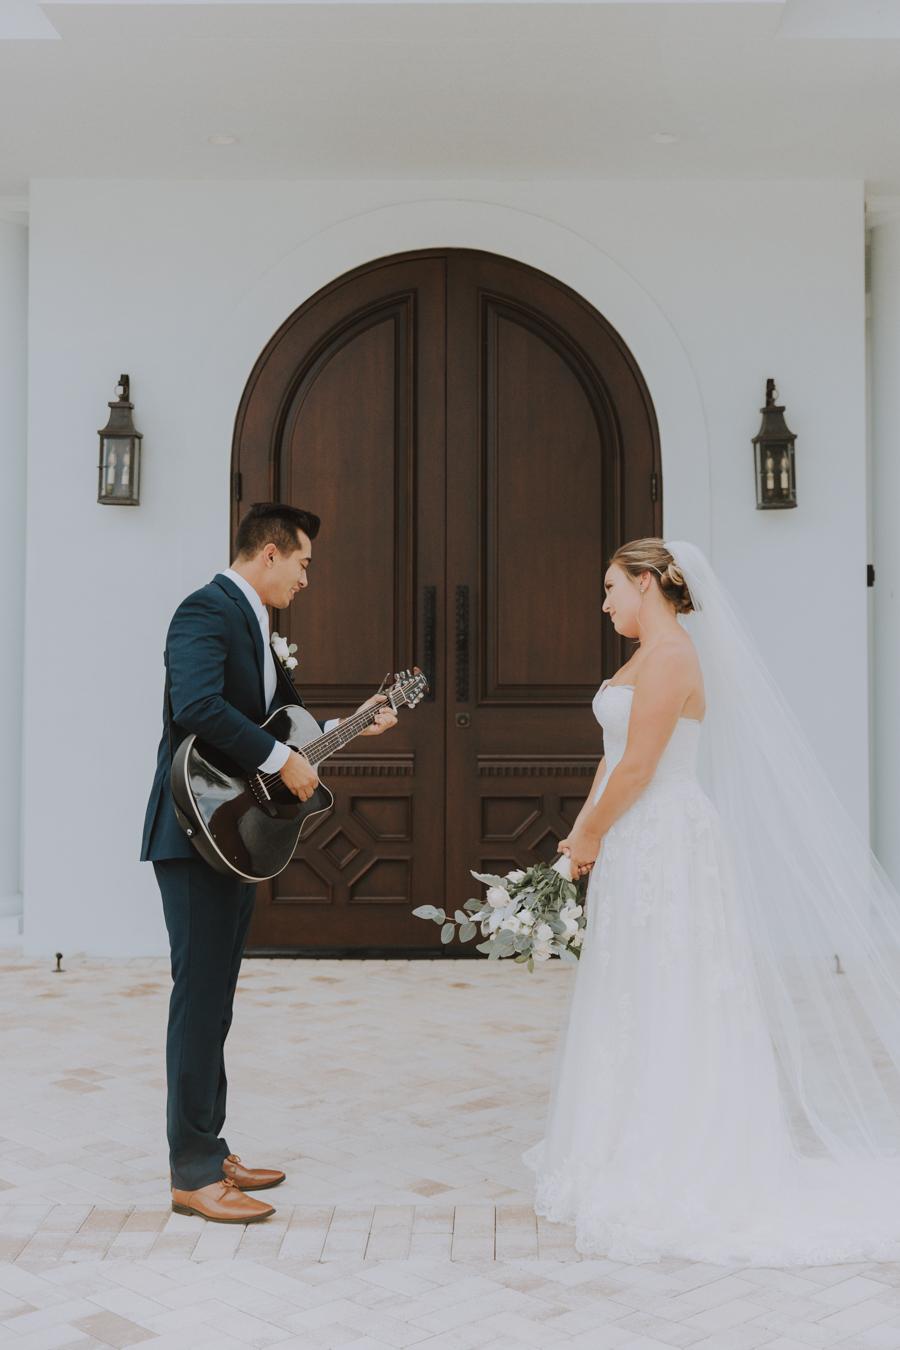 Harborside Chapel Wedding Clearwater Affordable Tampa Venues BHLDN Palm Harbor Safety Harbor Resort and Spa Wedding Malindy Elene Bridal St Pete Wedding Photographer Tampa Wedding Photographer-67.jpg